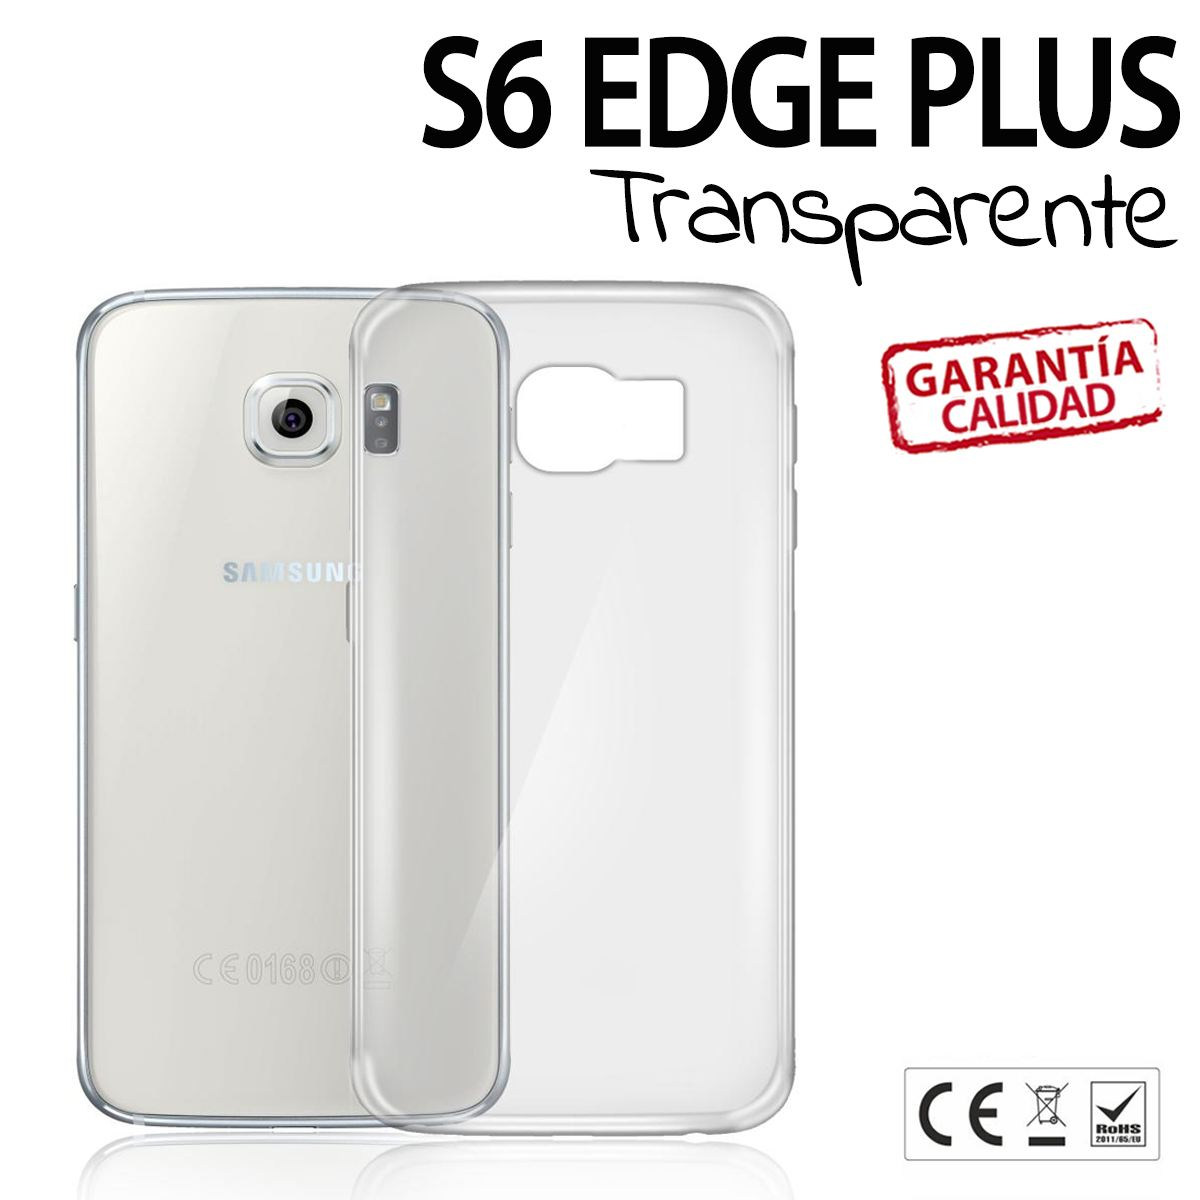 carcasa transparente galaxy s6